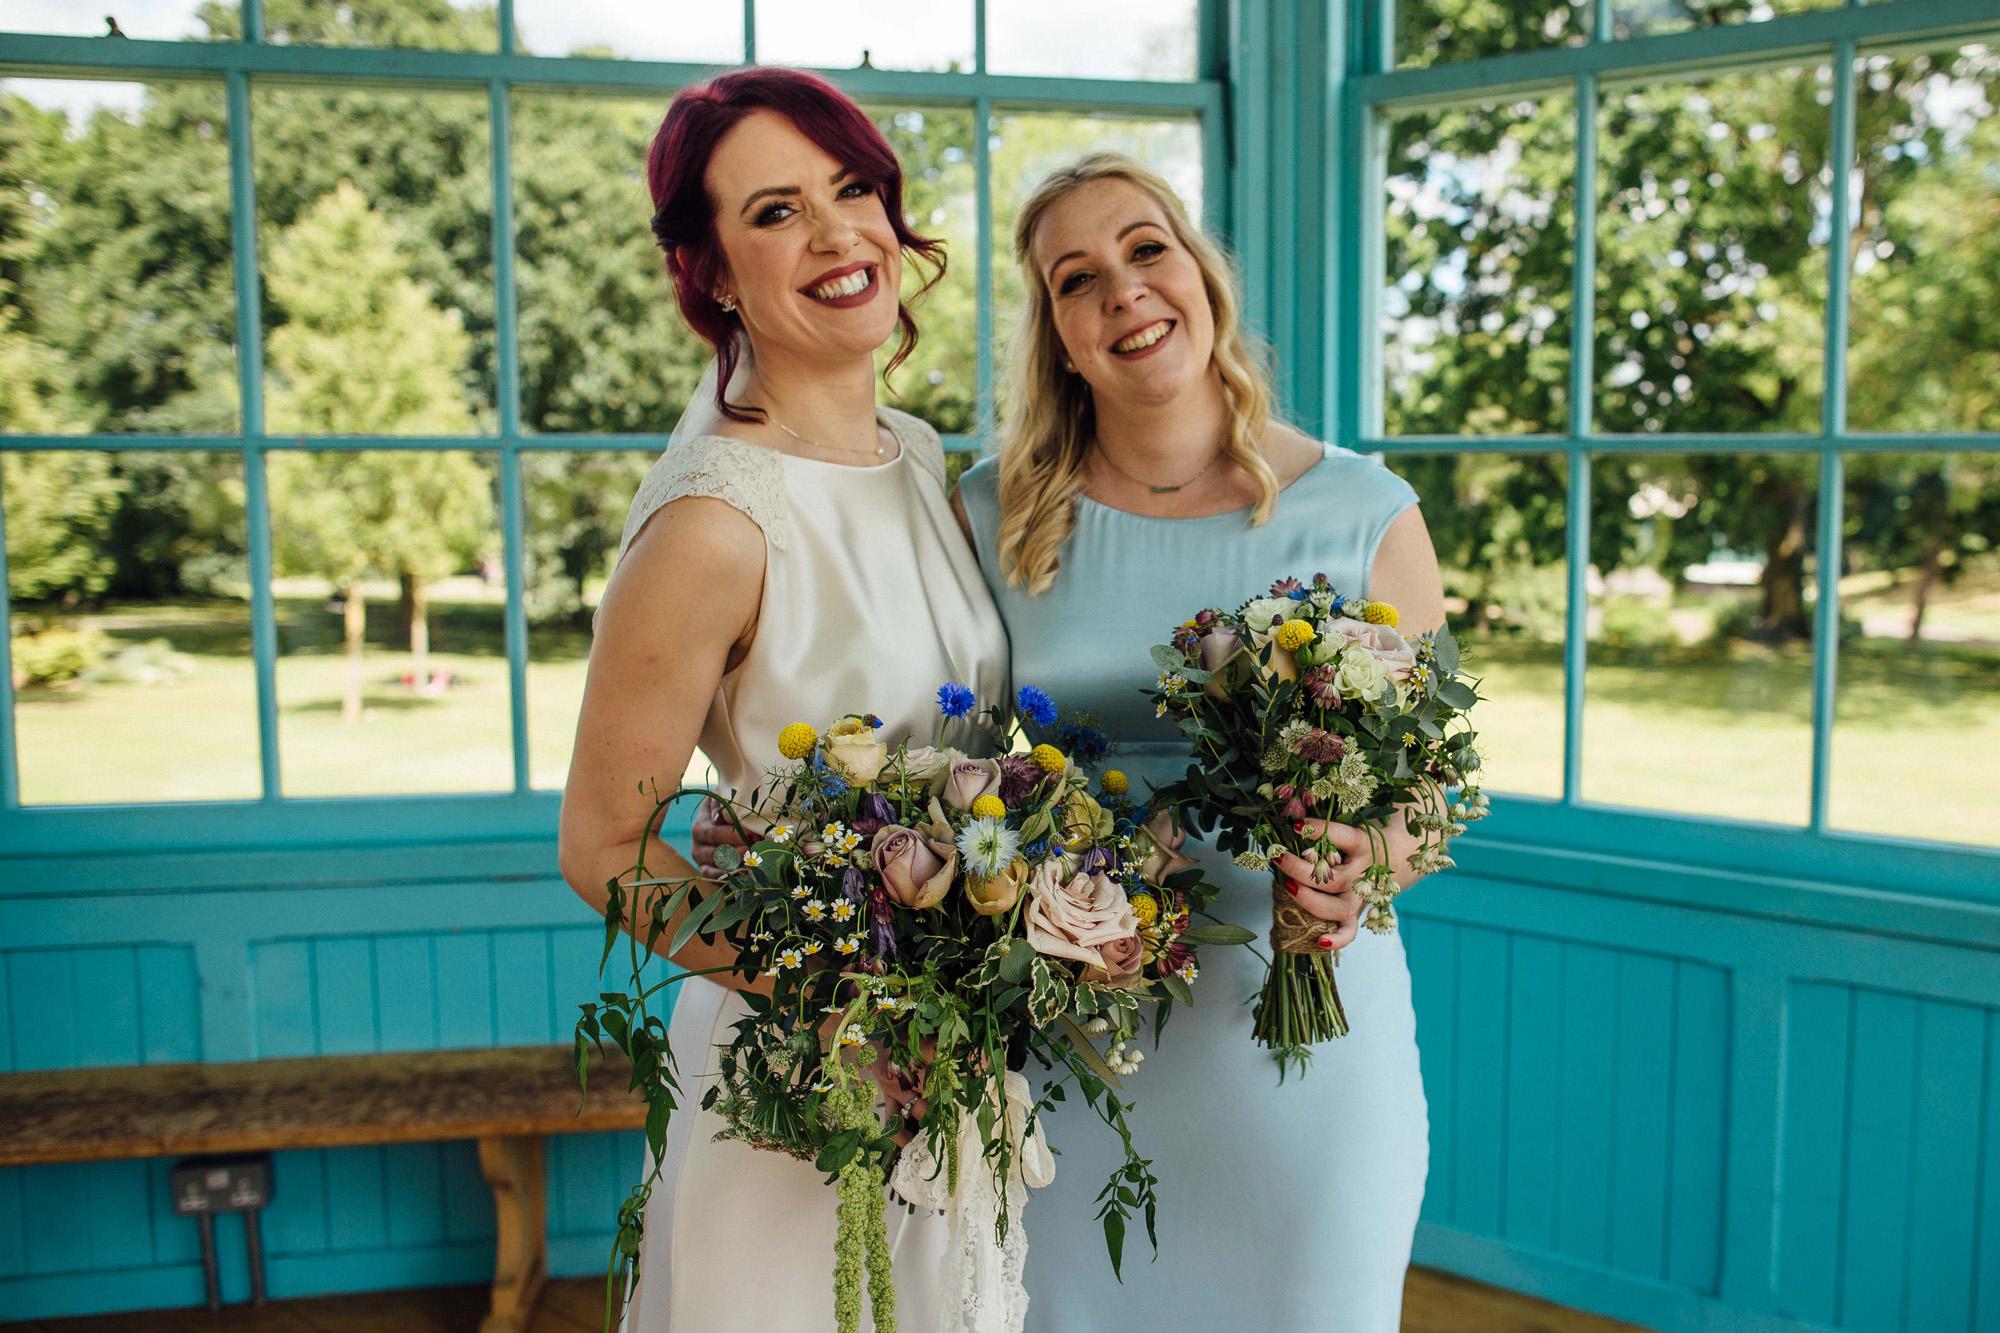 Sarah-Honeysuckle-Bias-Cut-Silk-Vintage-Inspired-Wedding-Gown-Sheffield-Wedding-Kate-Beaumont-25.jpg